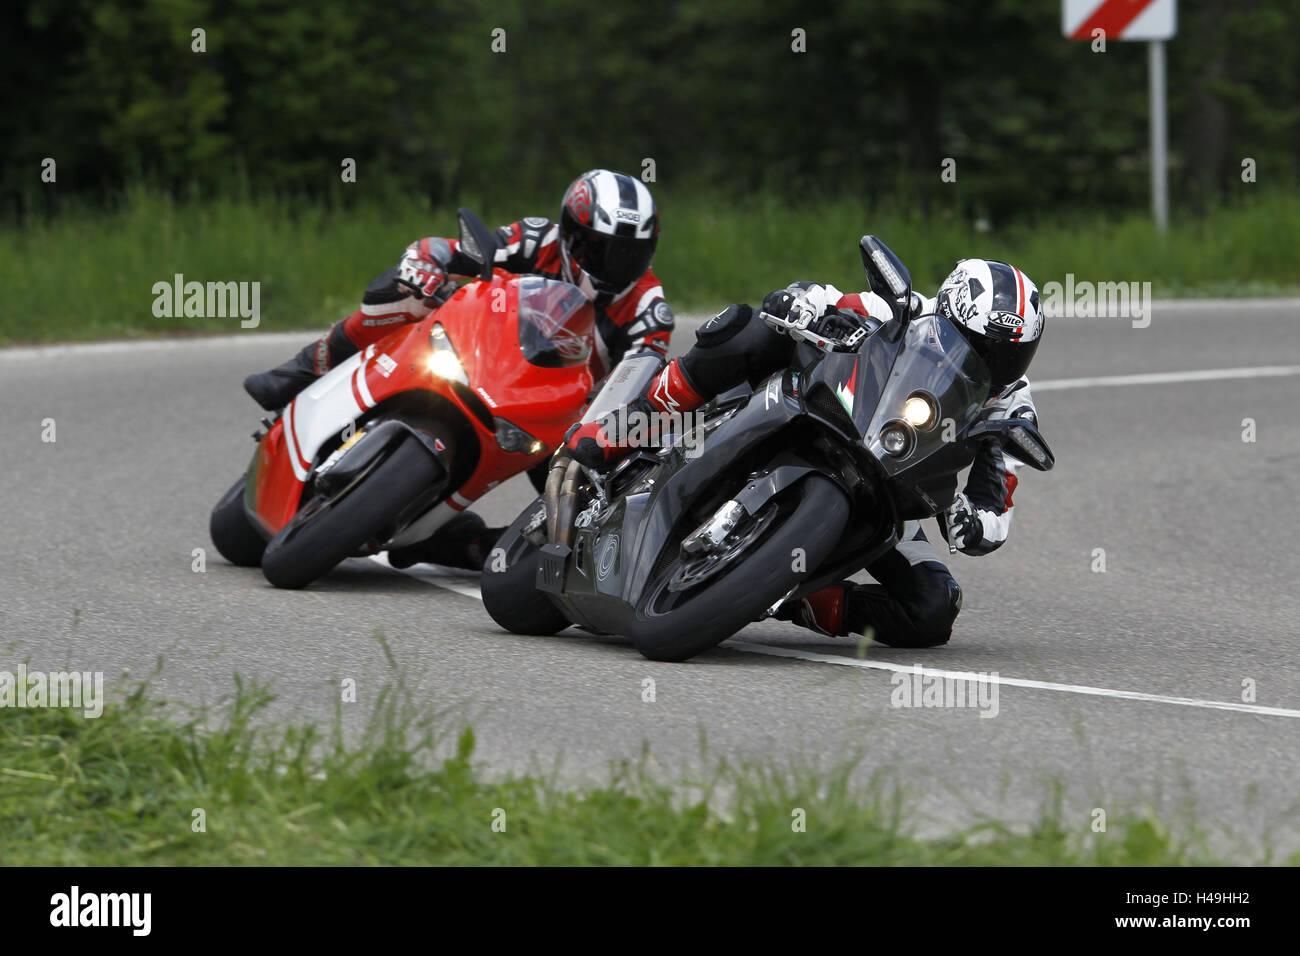 Motorcyclist, motorcycle, motorcycles 2nd group, Bimota Millenovantotto, Ducati Desmosedici RR, noble Italian, bend, - Stock Image